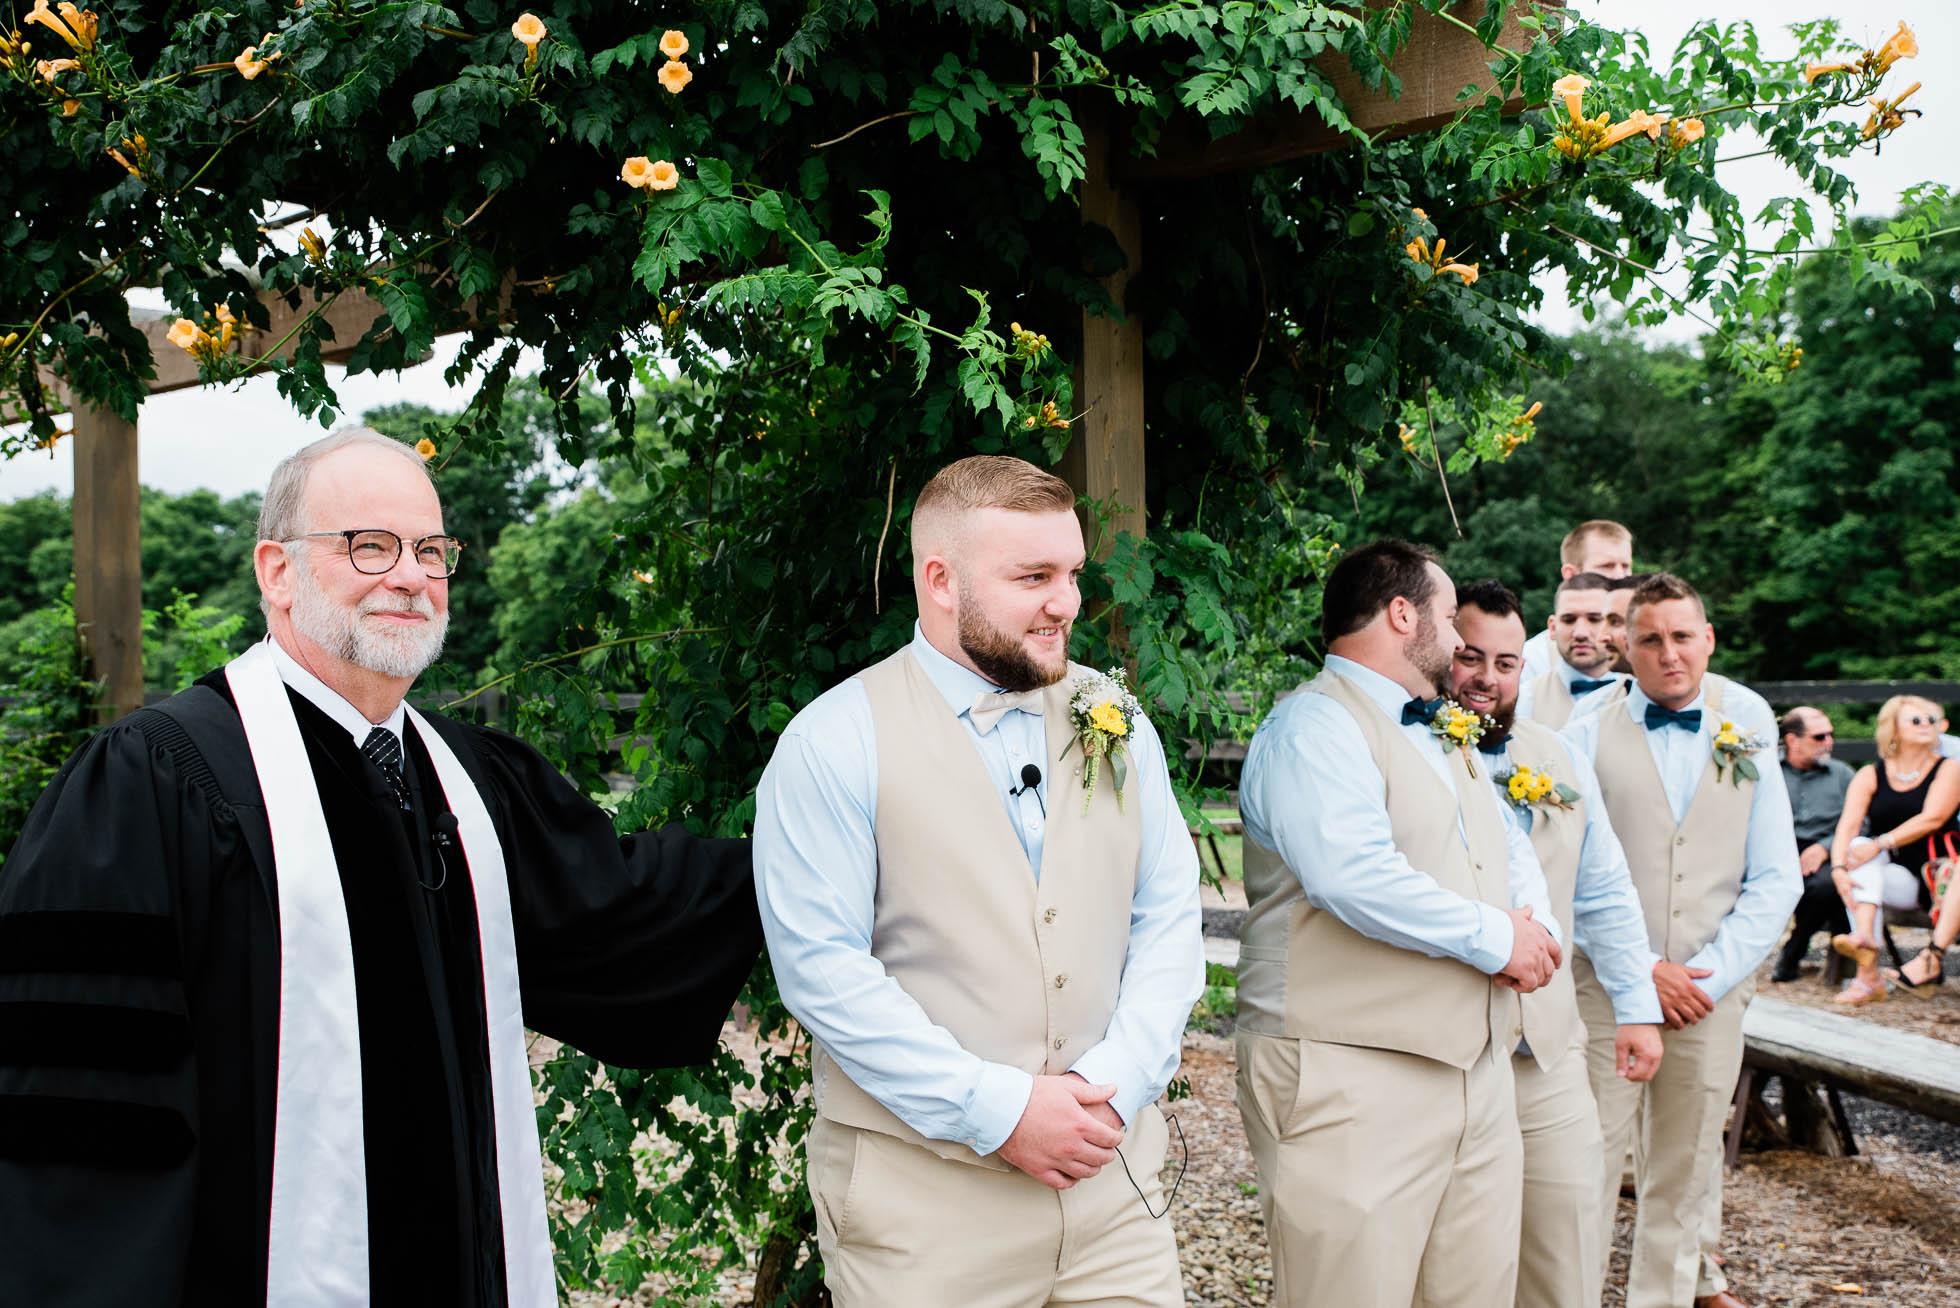 The Hayloft of PA, wedding ceremony Mariah Fisher, Pittsburgh PA wedding photographer-12.jpg